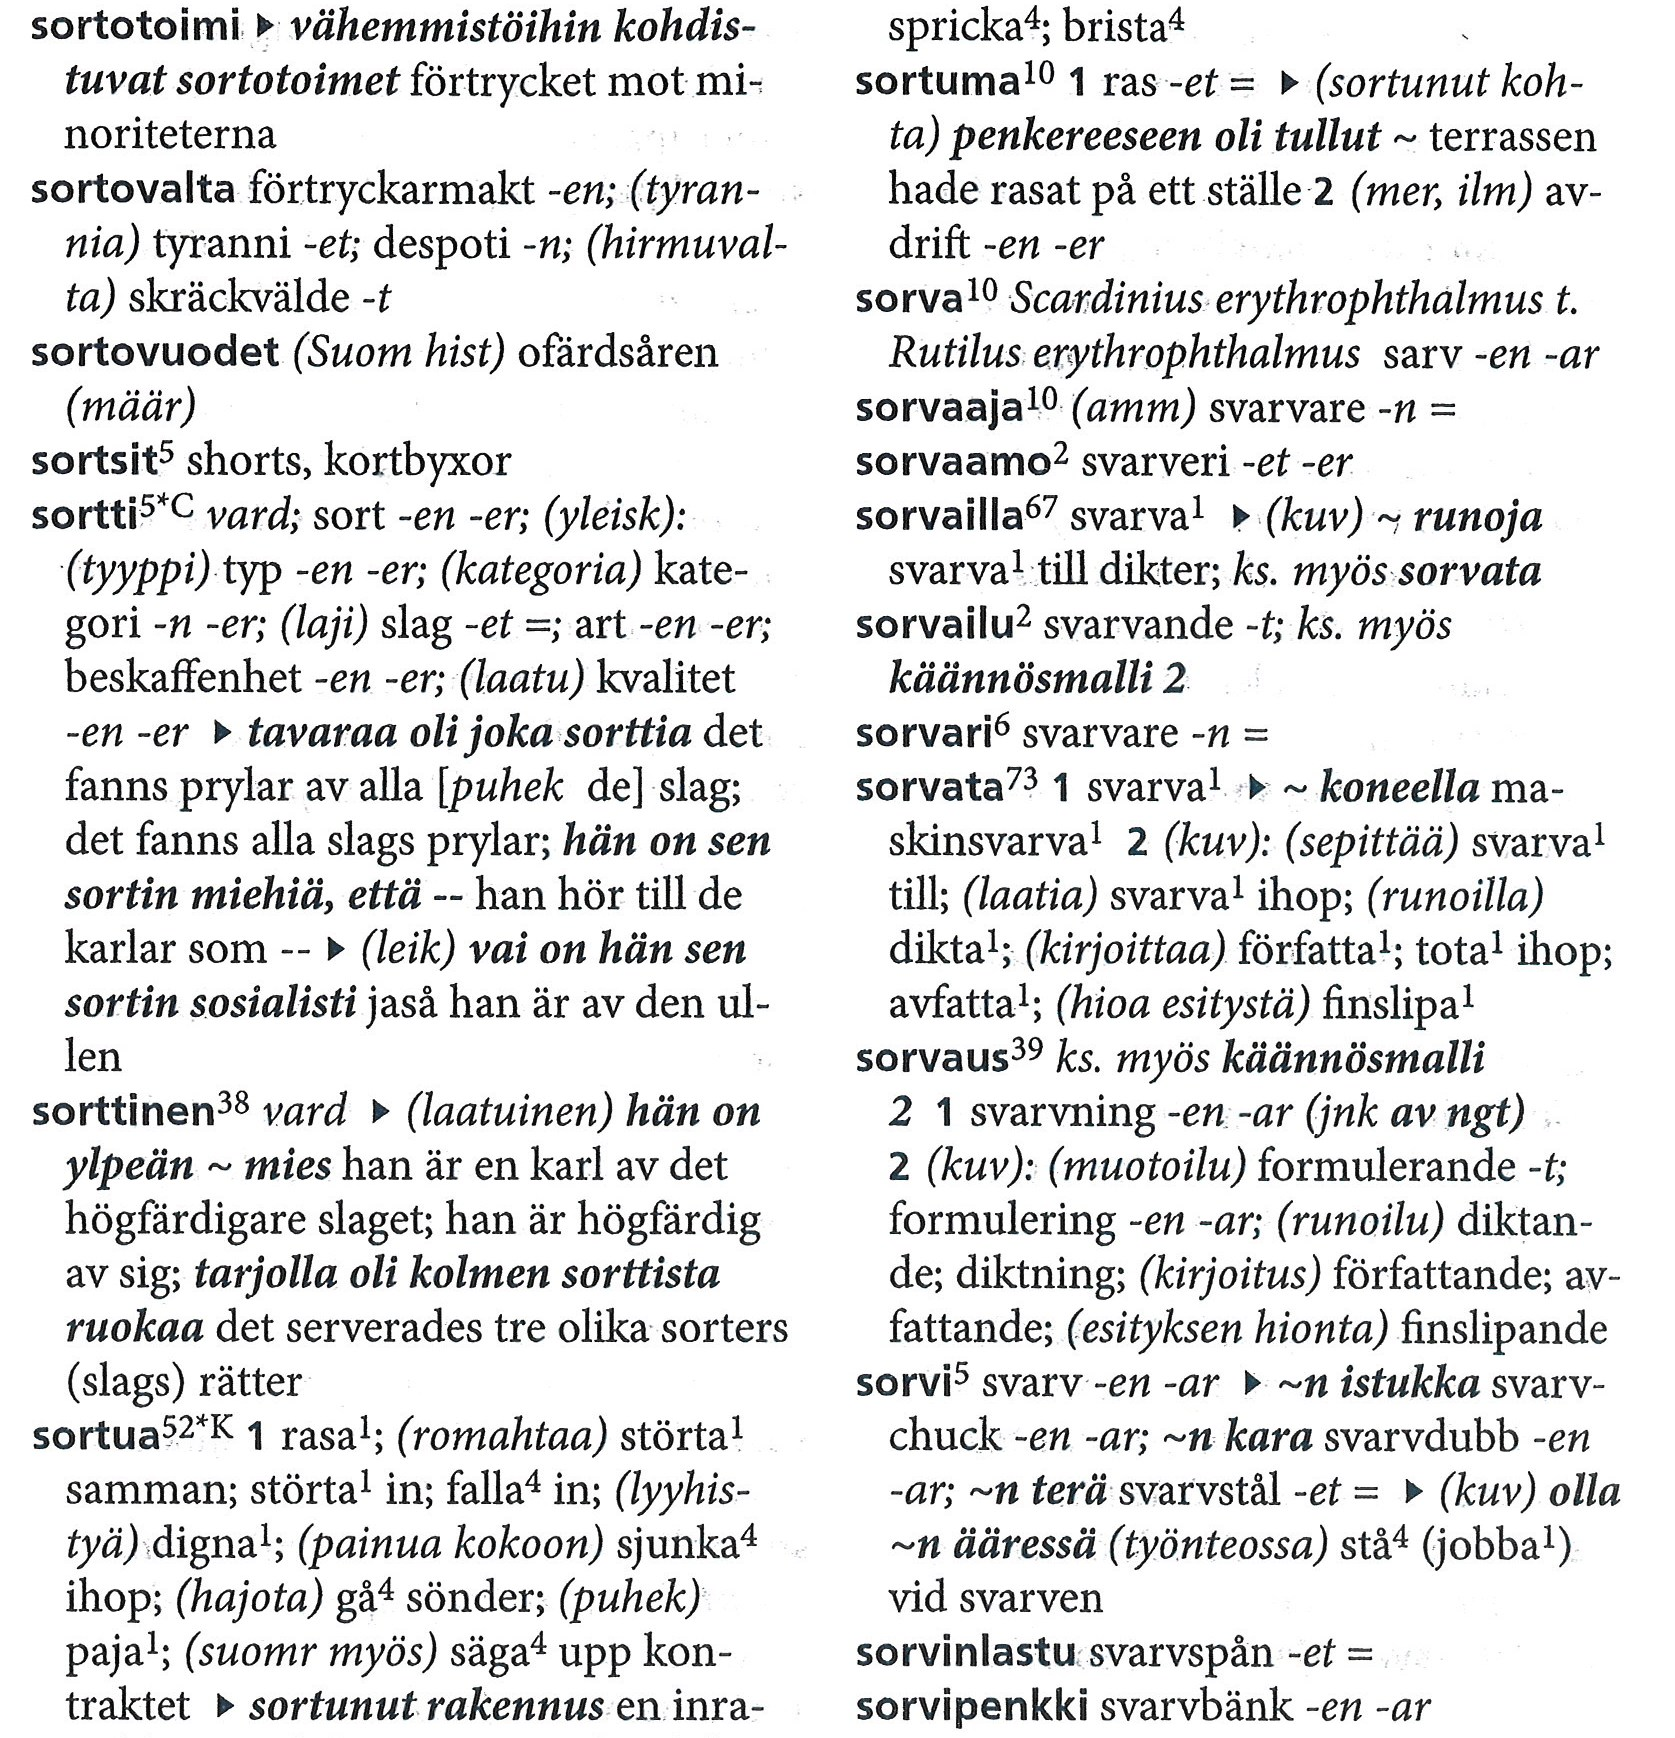 products center for leksikografi ordbogen over faste vendinger.